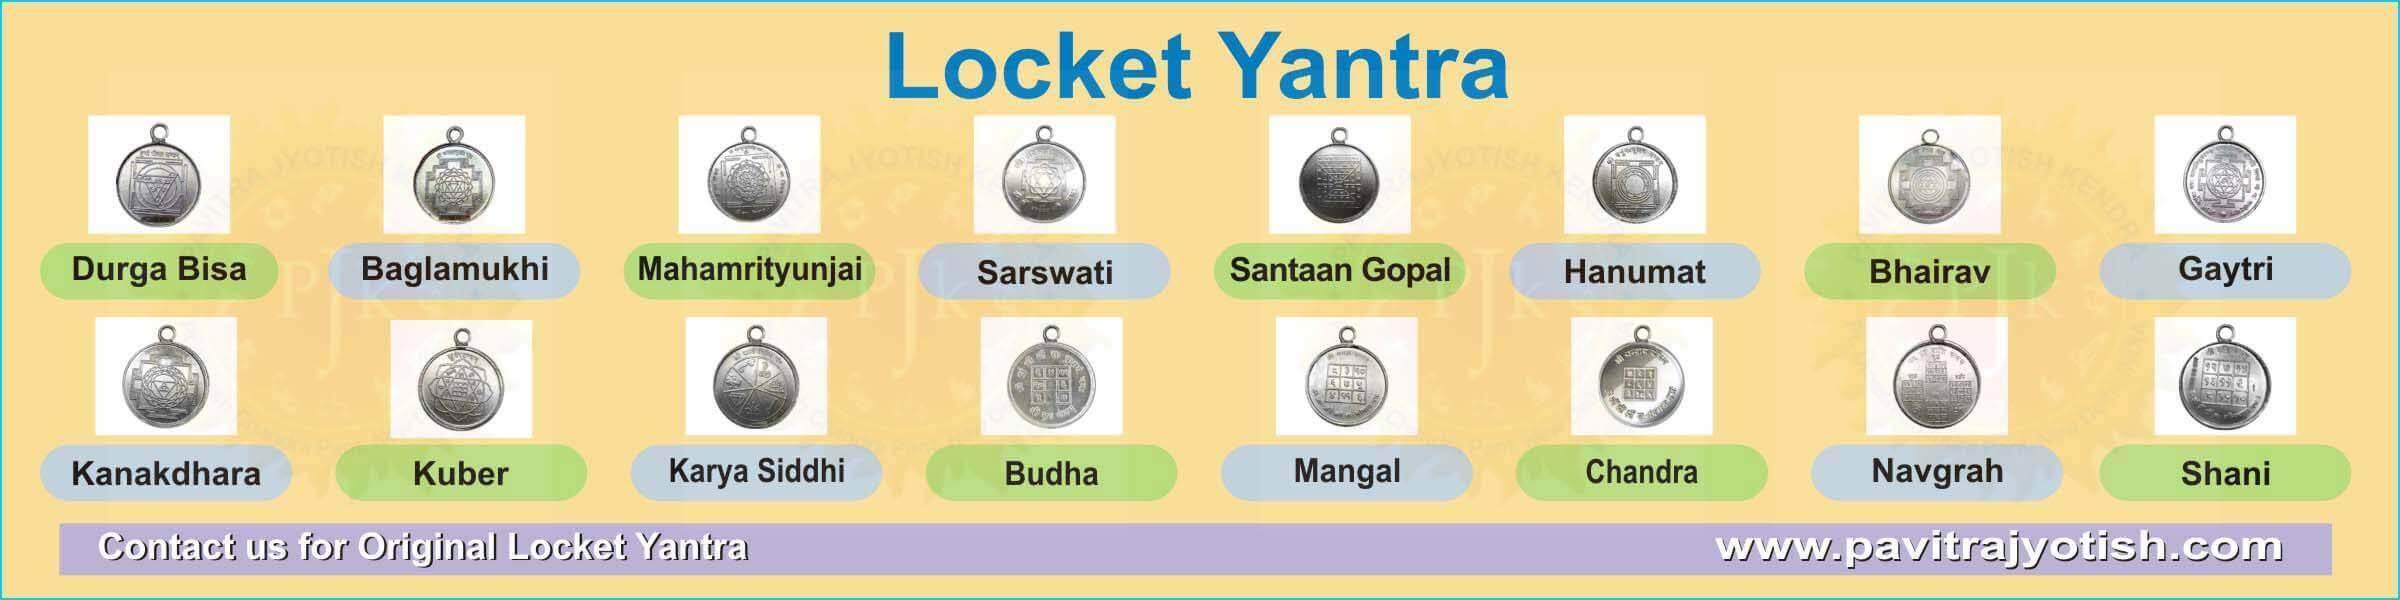 Locket Yantra